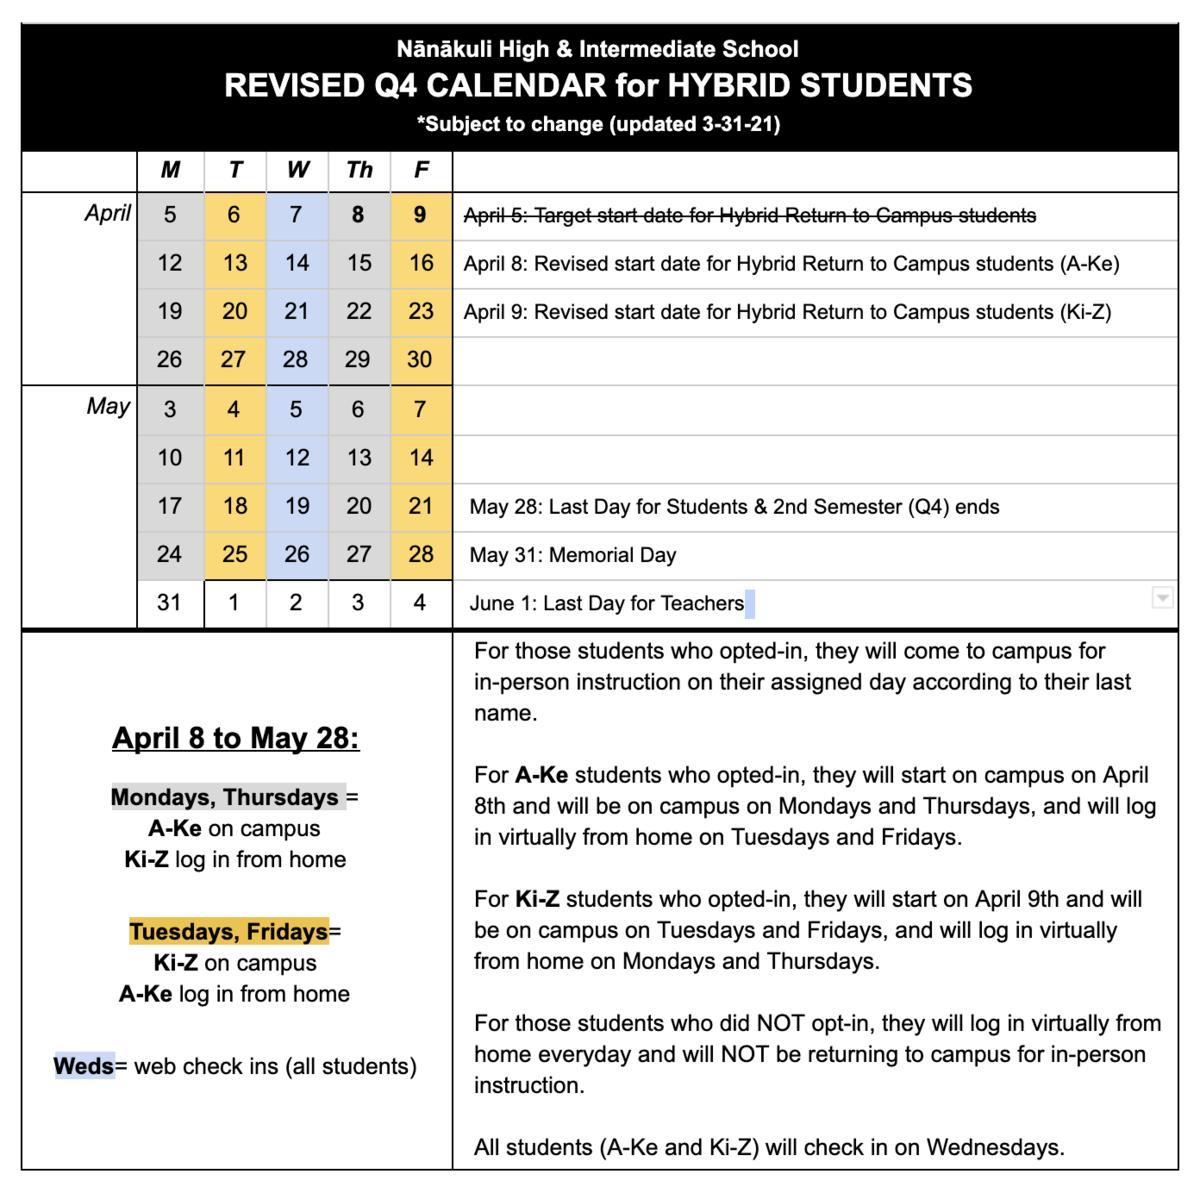 Q4 calendar